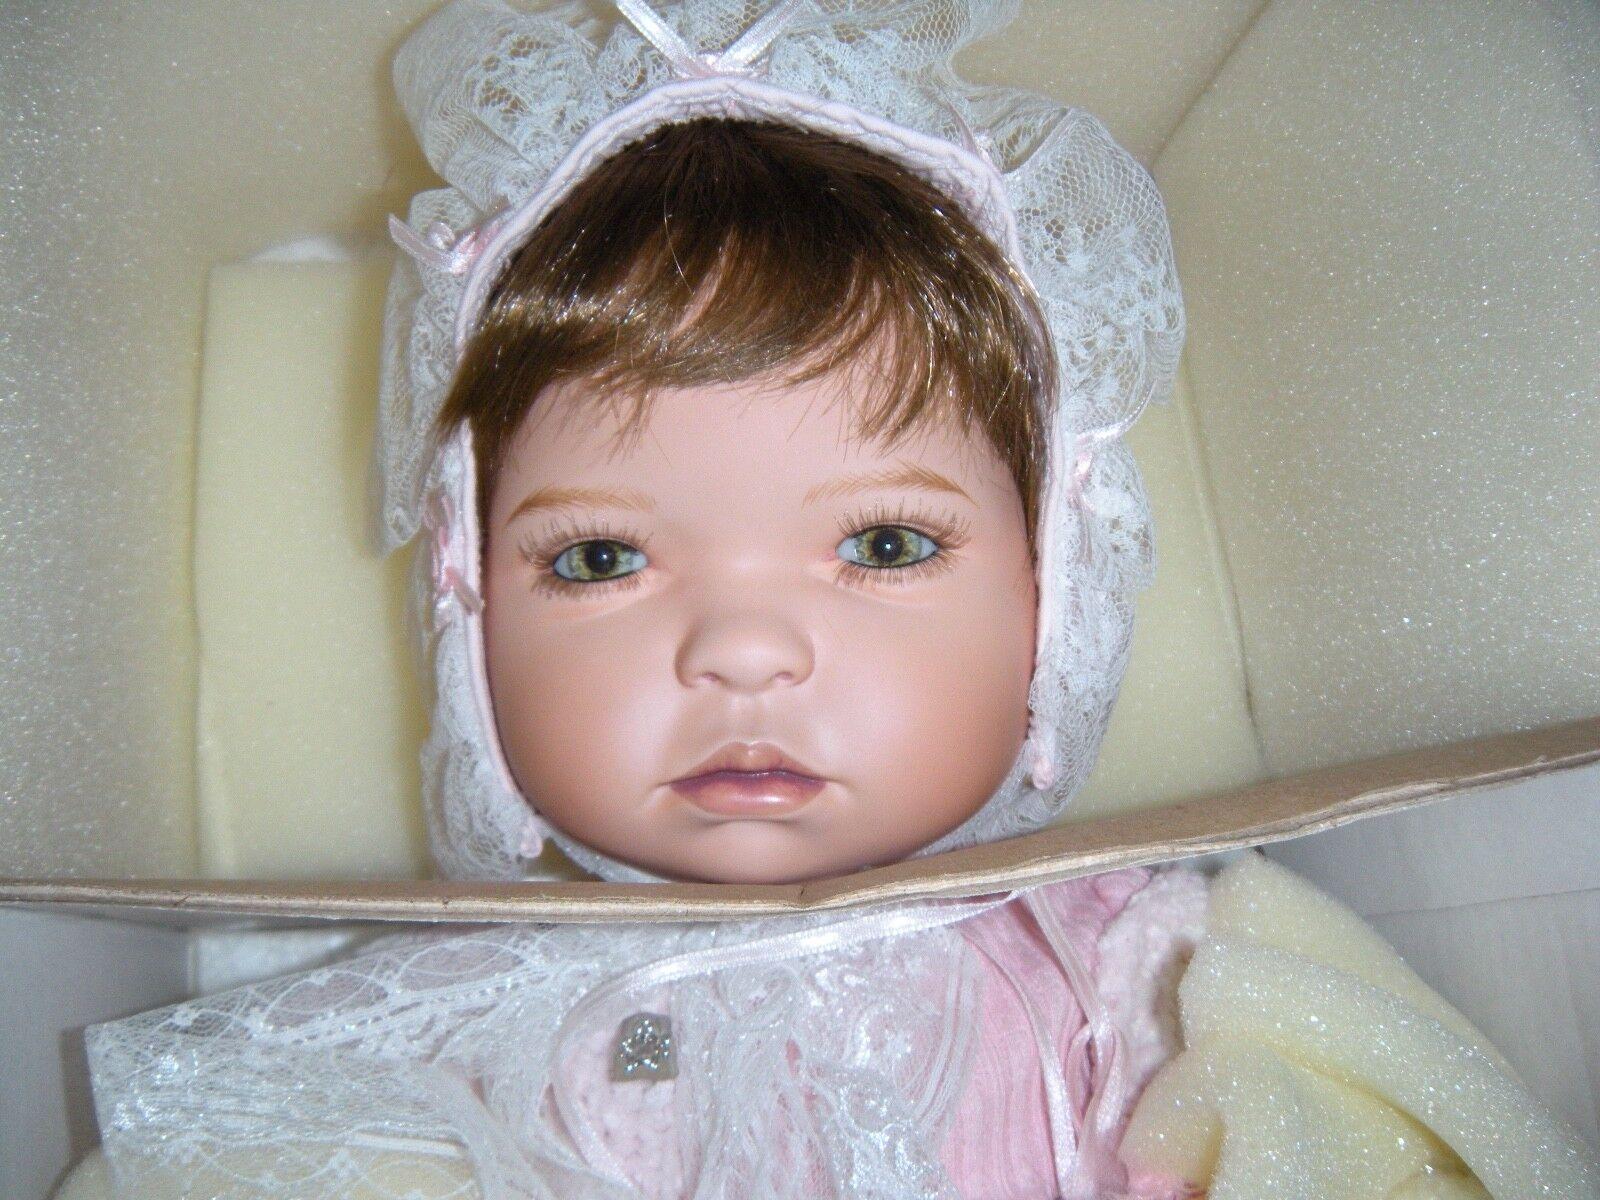 Gloria Vanderbit as a Newborn Baby Limited ED Porcelain Doll By Pamela Erff NEW